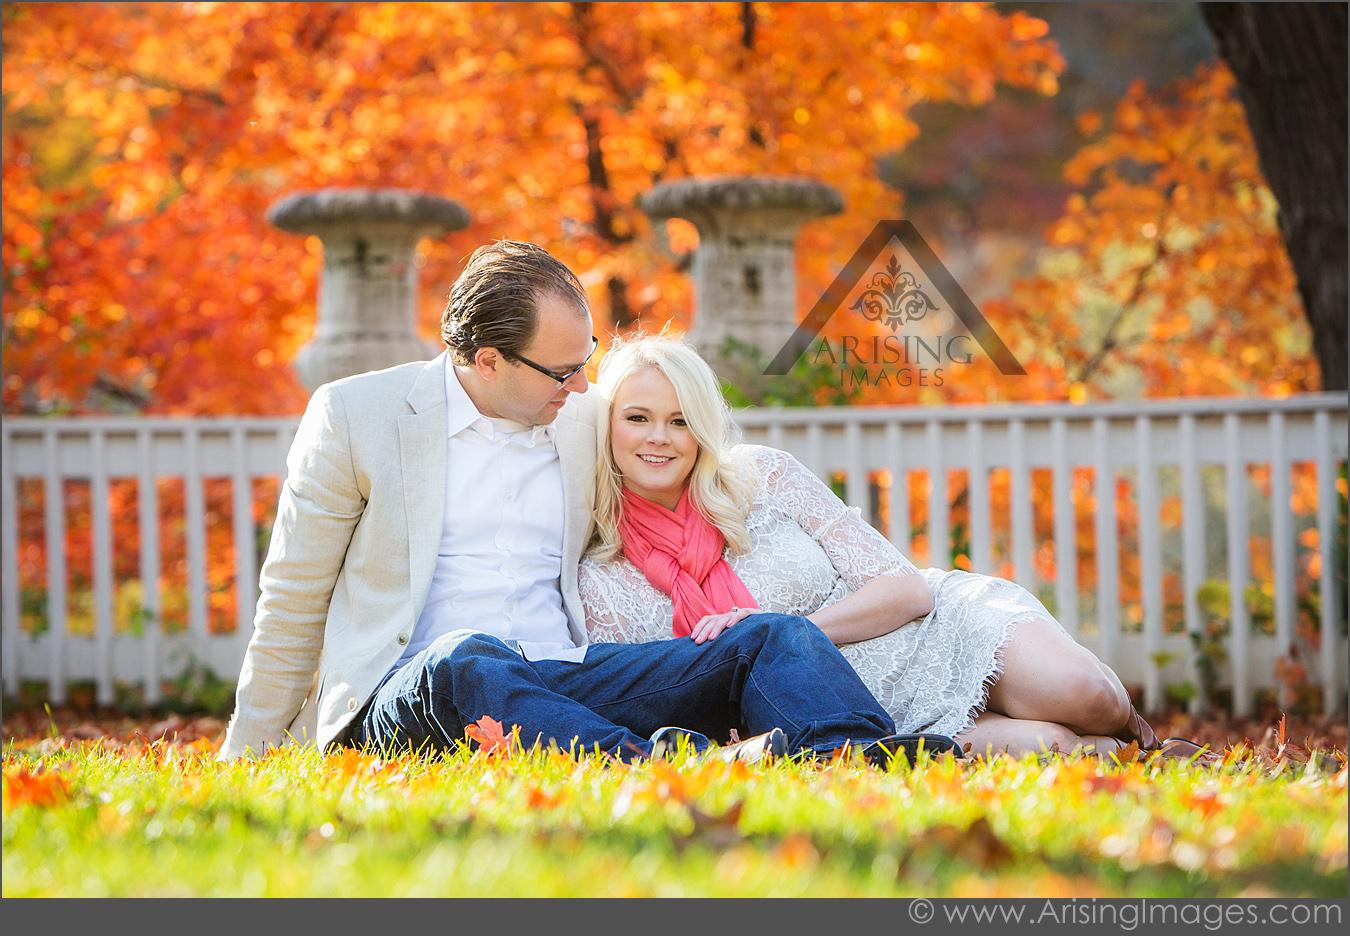 Stunning Autumn Engagement Photography